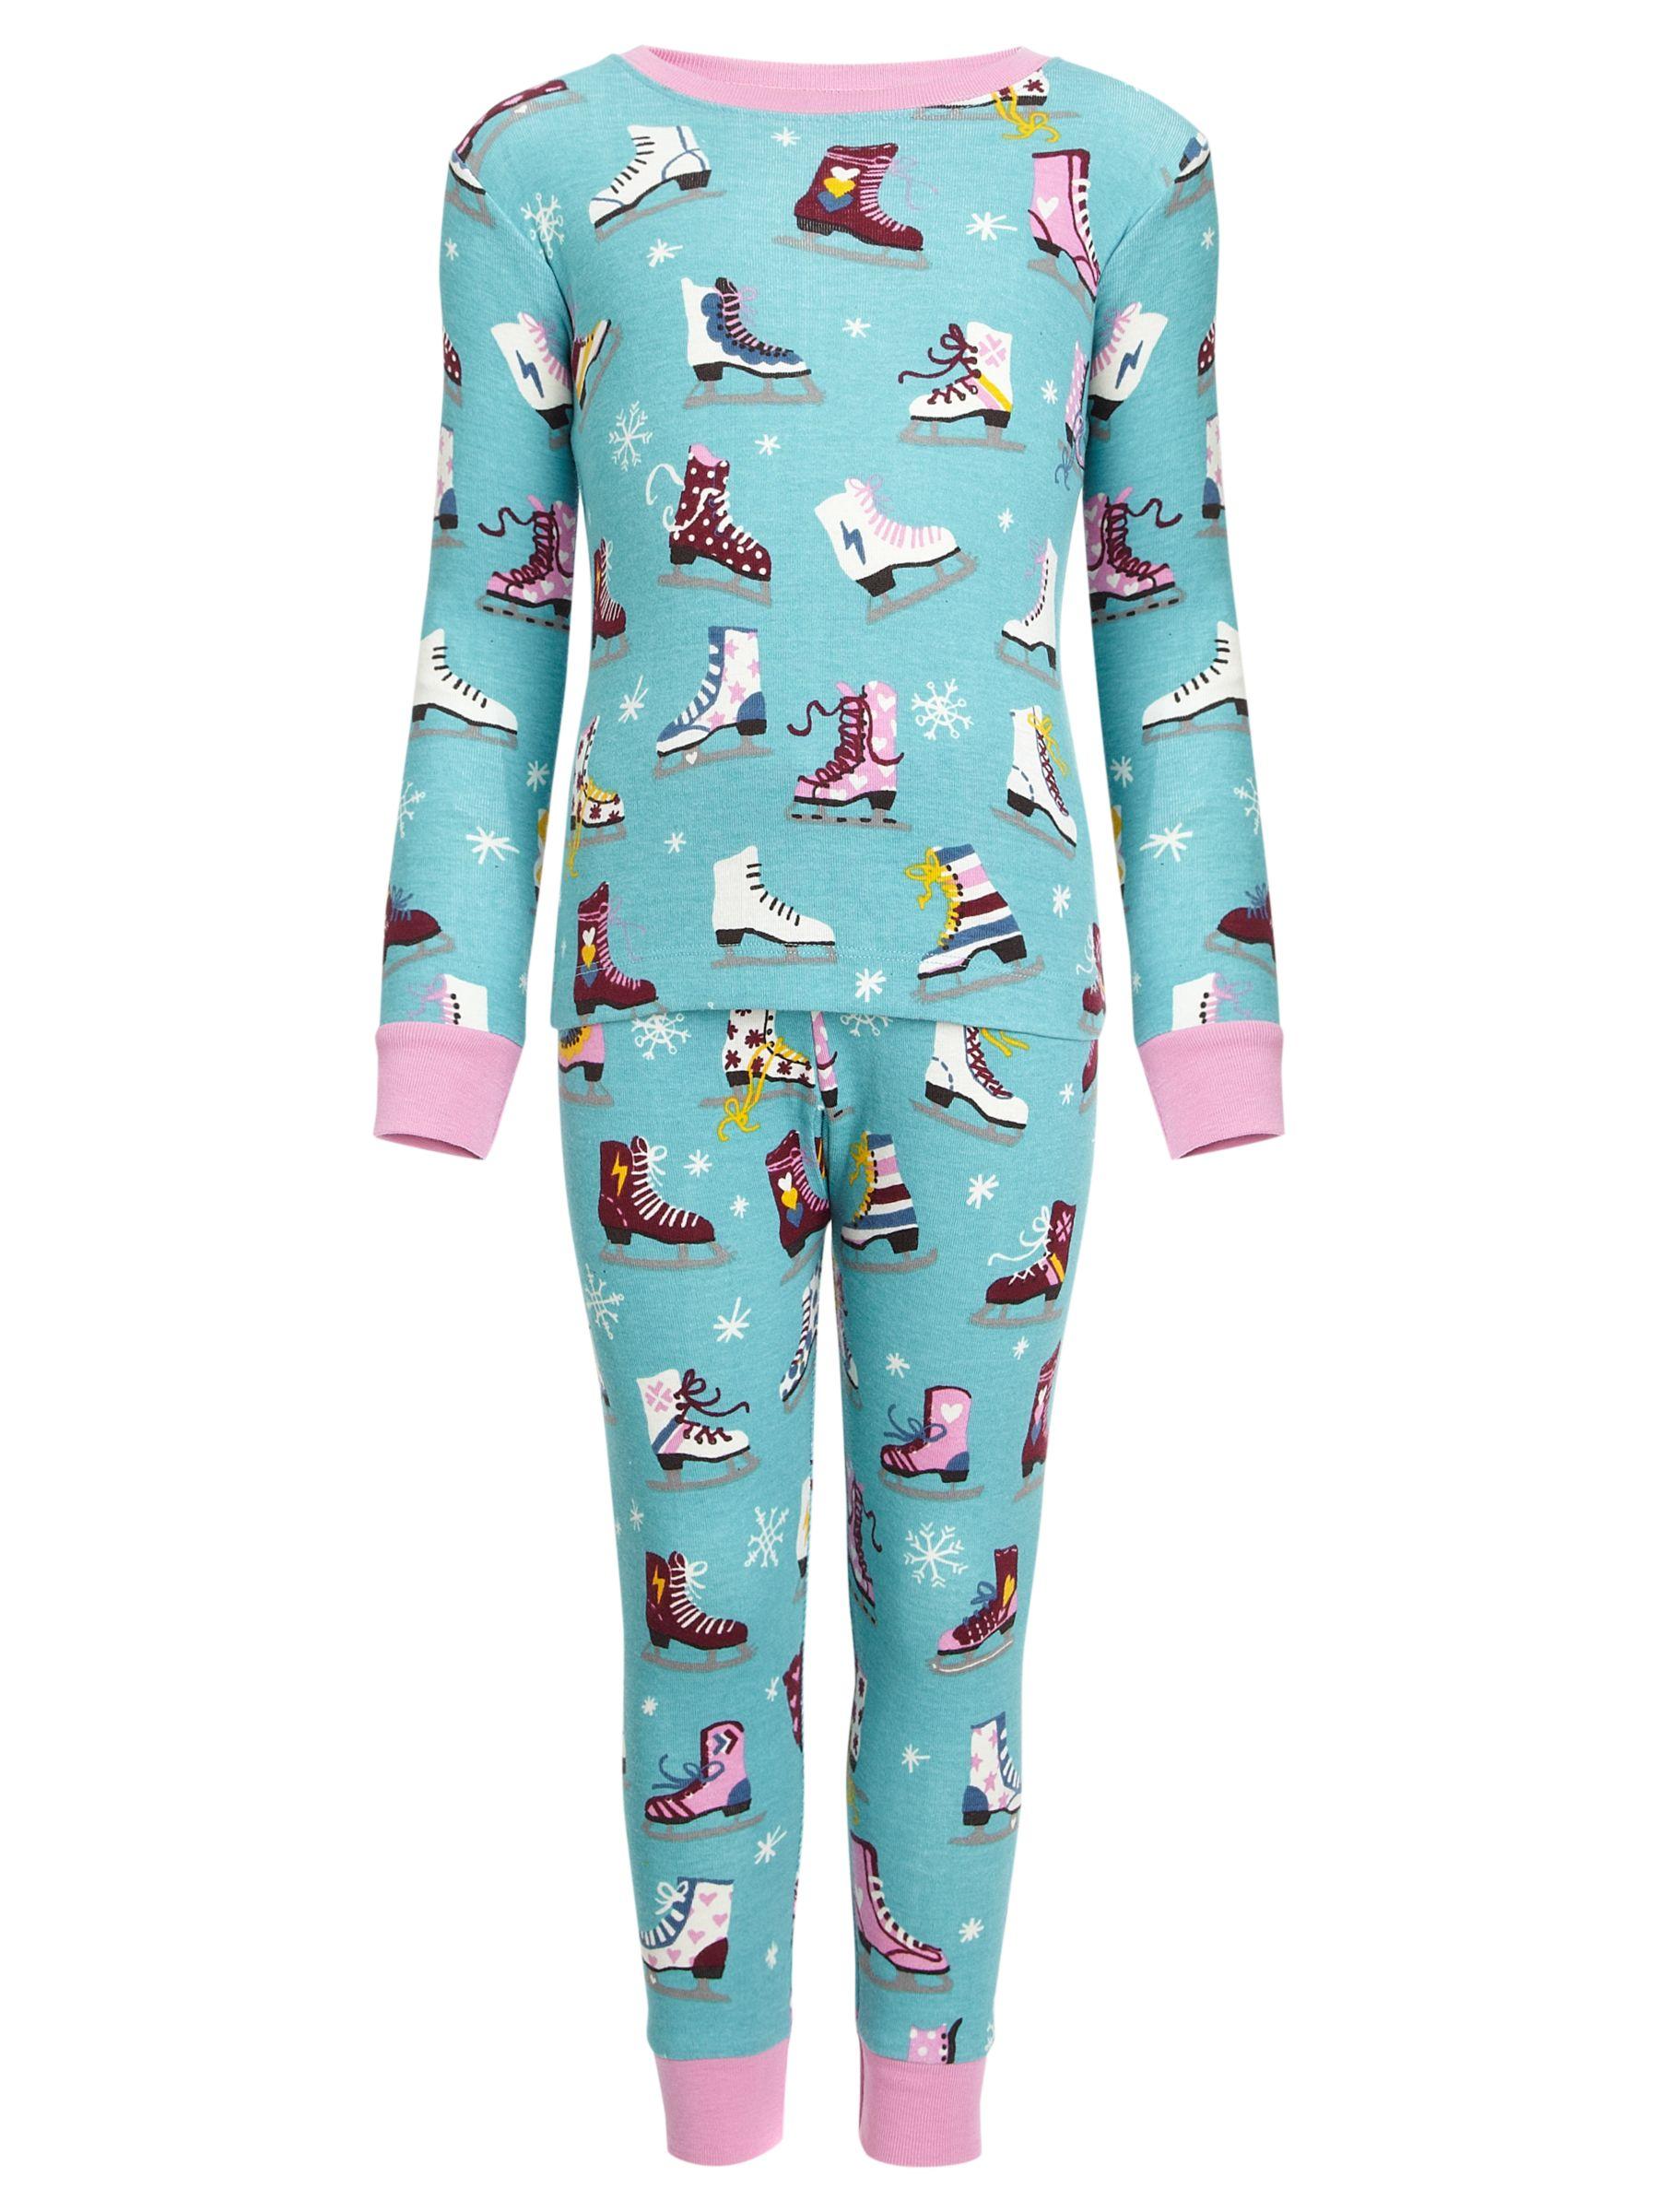 Hatley Skate Pyjamas, Multi